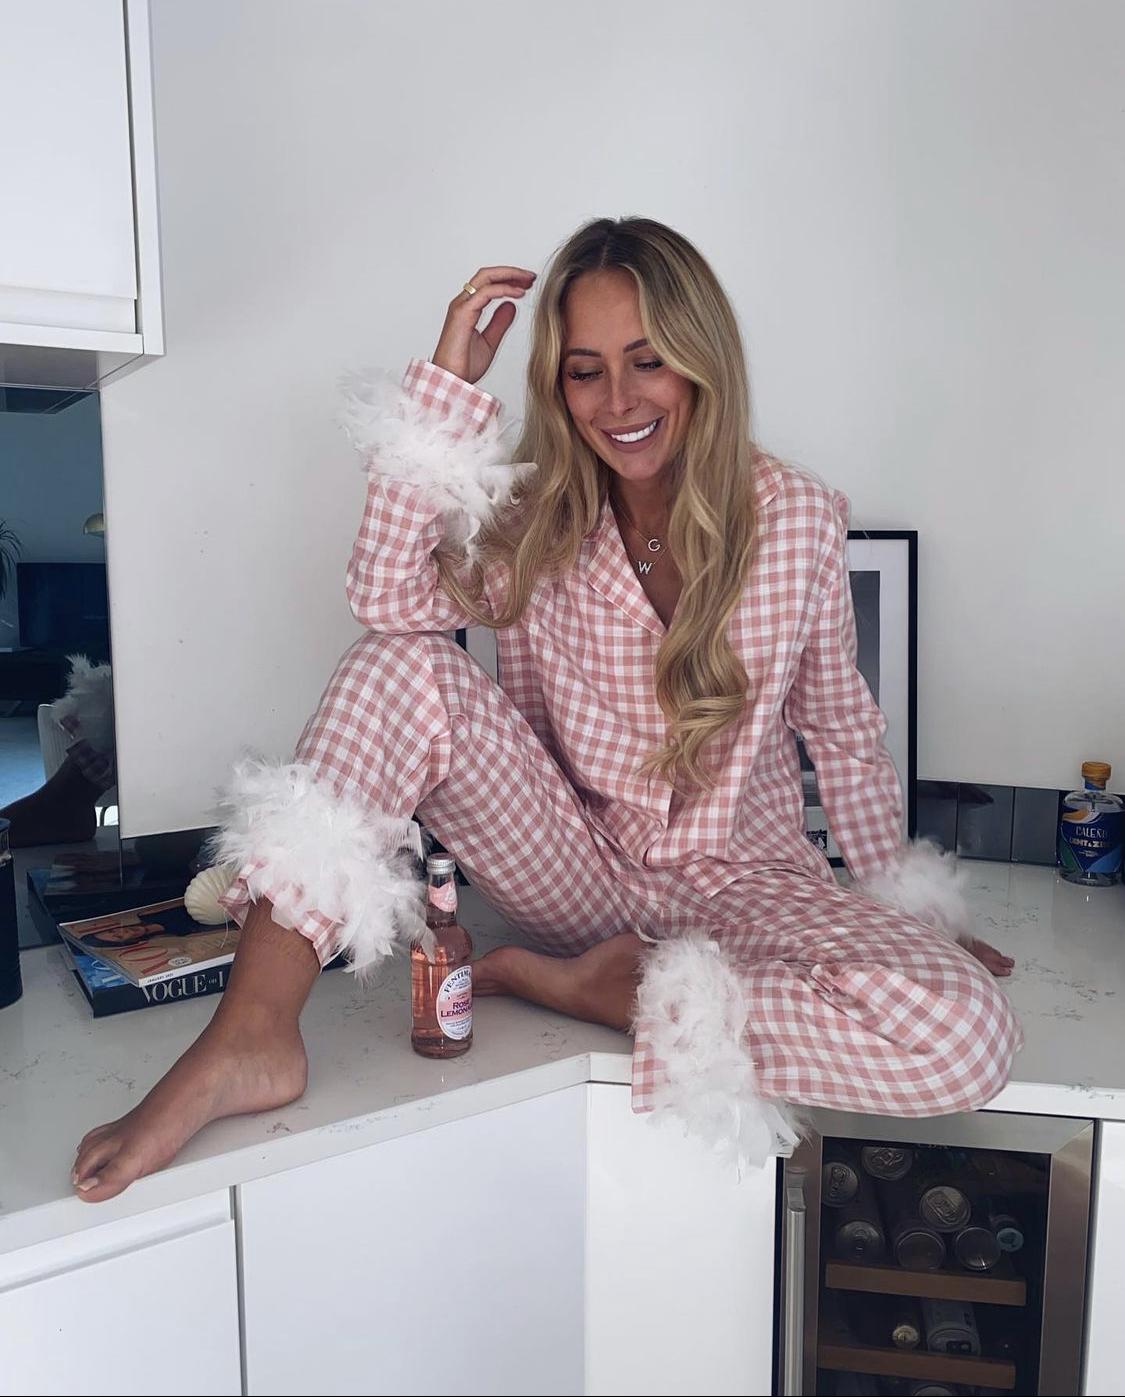 Pyjama vải cotton kẻ sọc